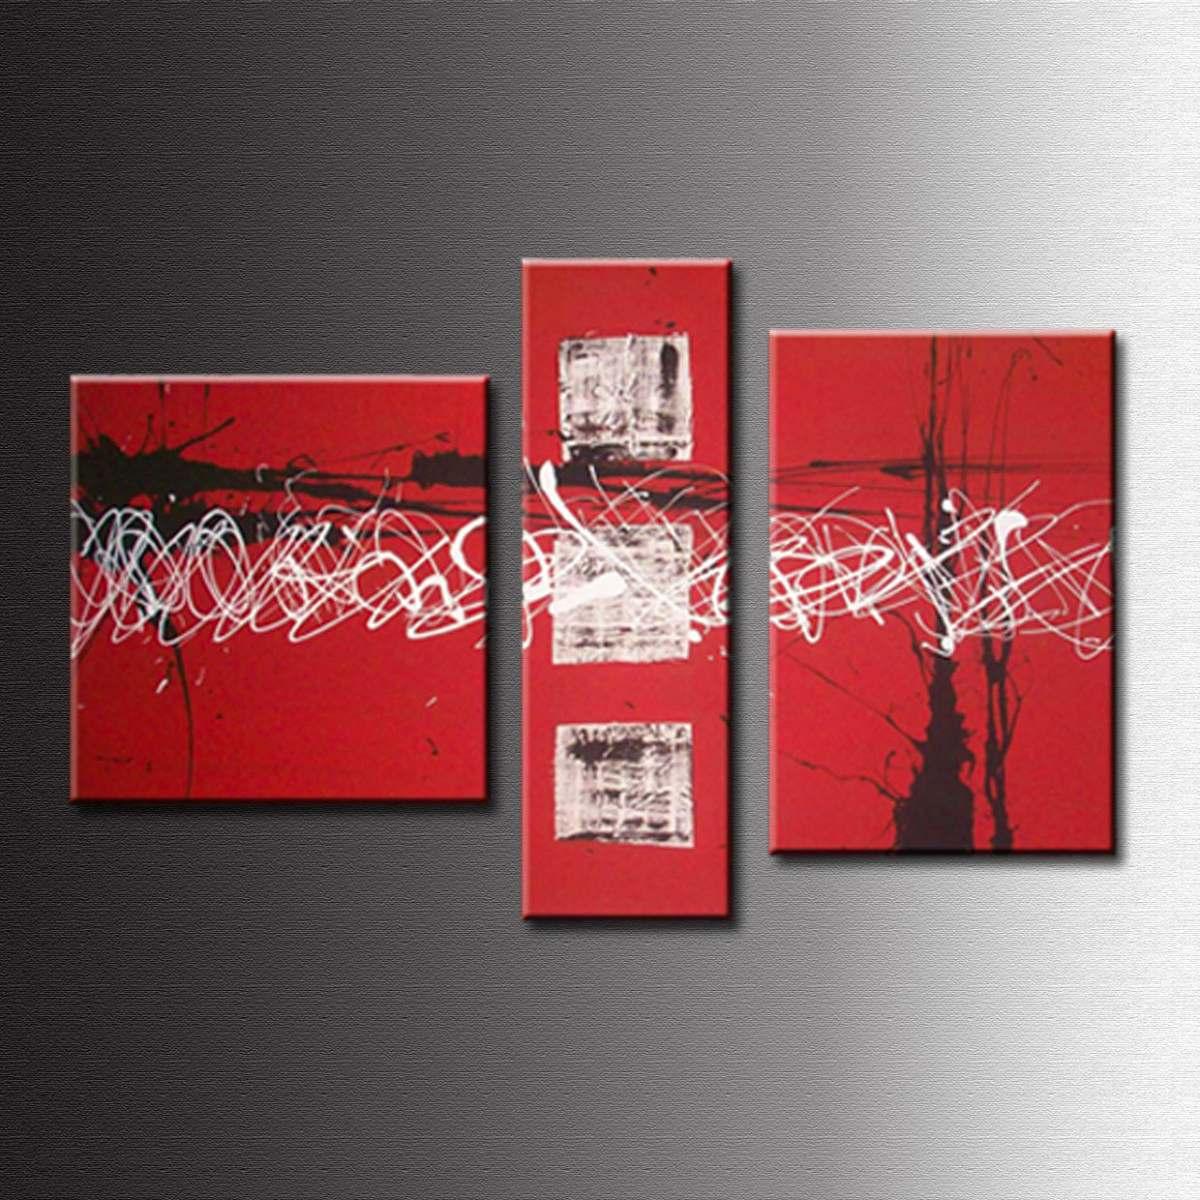 Cuadros Abstractos Tripticos Modernos Decoracion Pinturas Cuadros